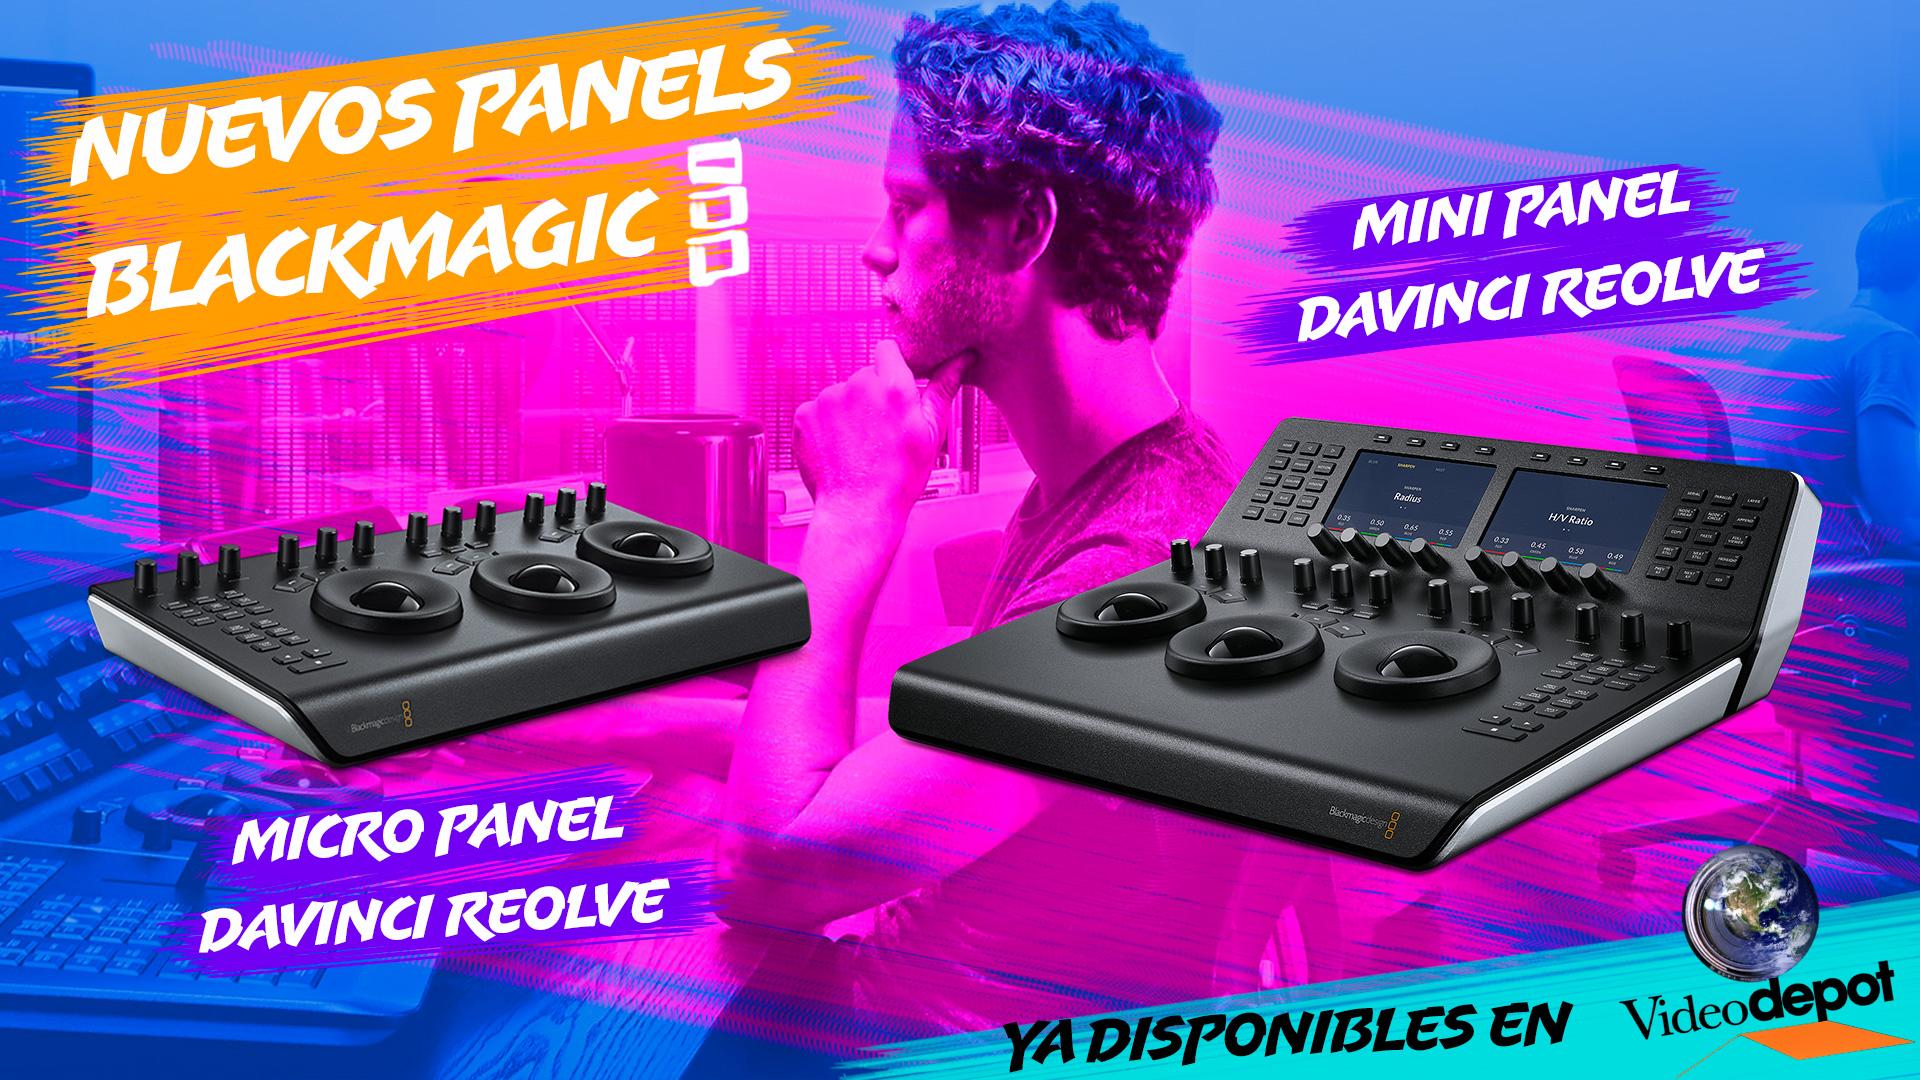 nuevos-paneles-davinci-blackmagic-vidoedepot